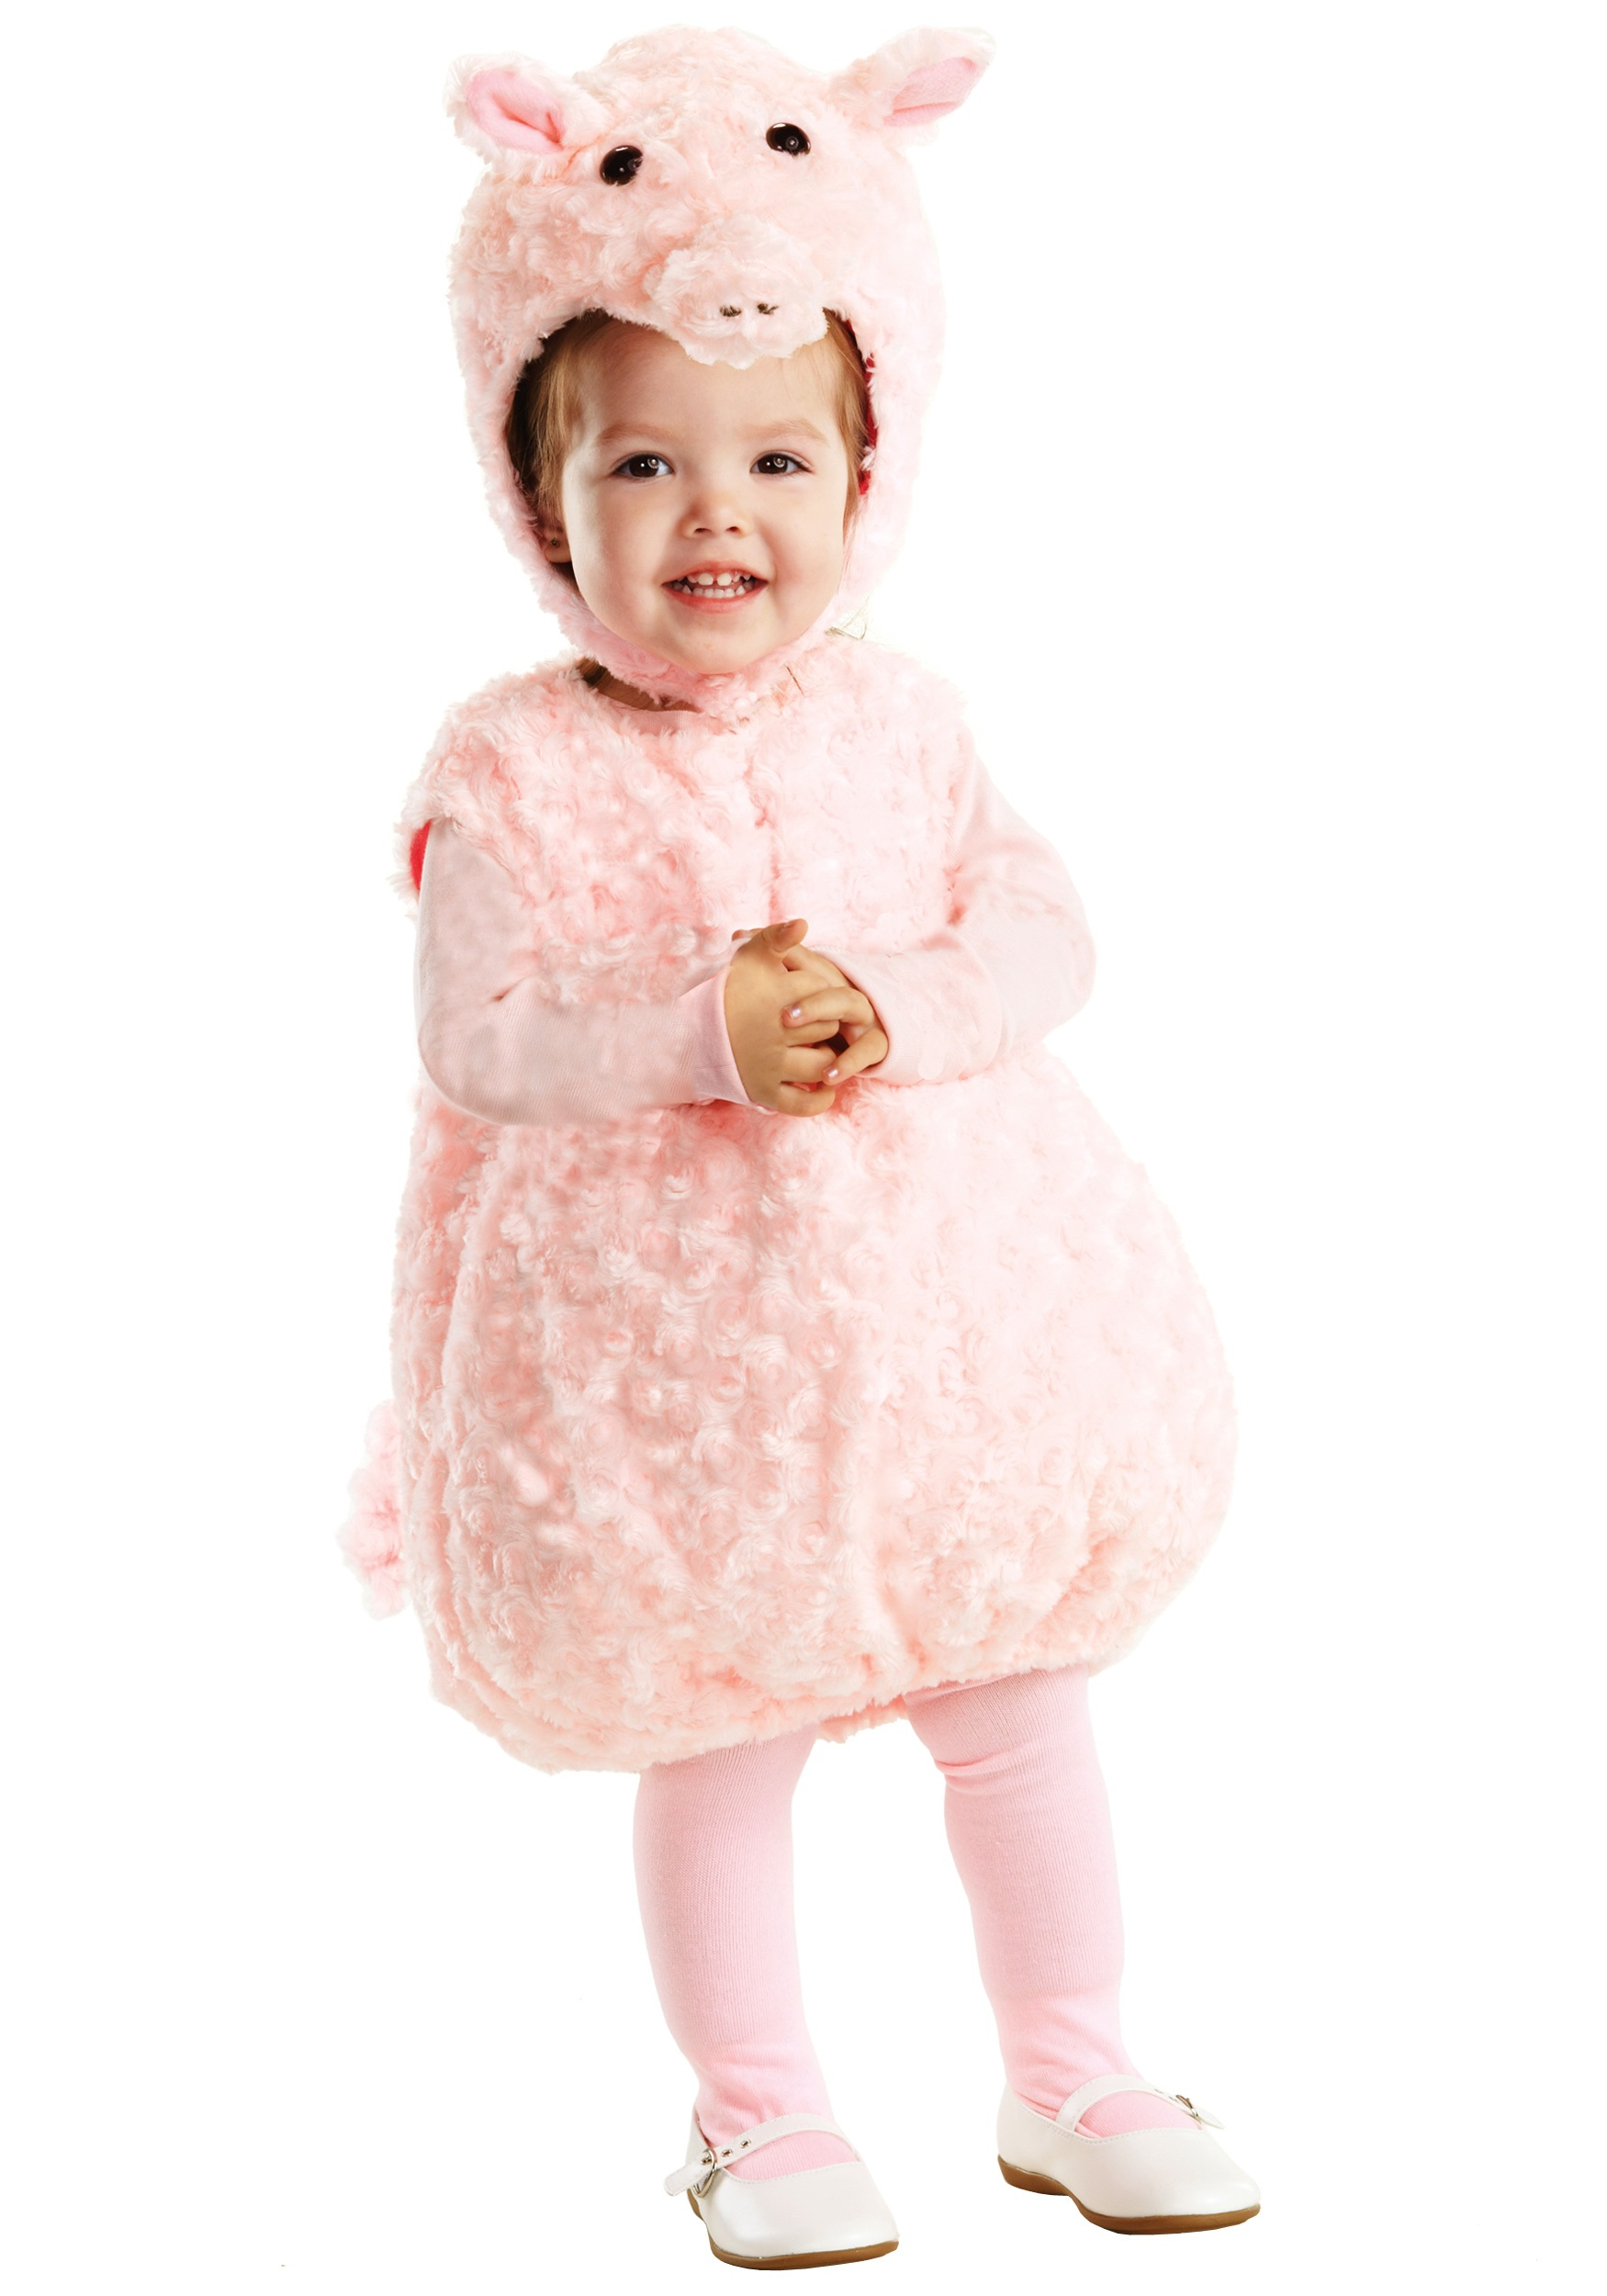 Toddler Pink Lil Piggy Costume  sc 1 st  Halloween Costume & Toddler Pink Lil Piggy Costume - Child Baby Farm Animal Costume Ideas